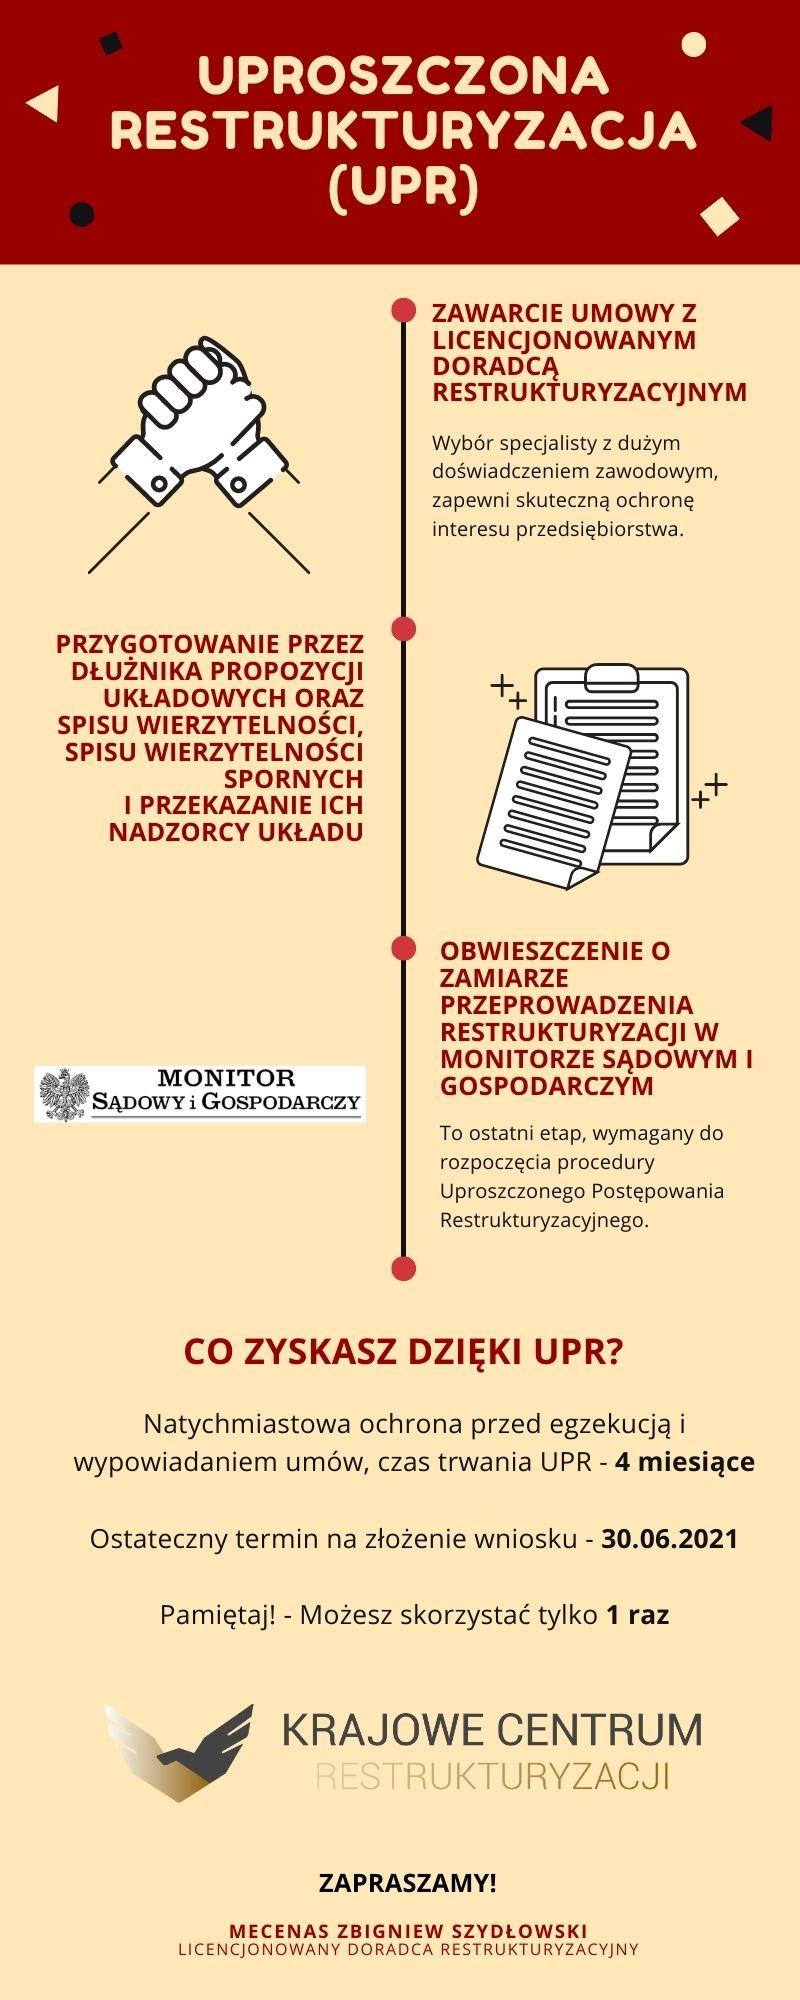 https://kcr.org.pl/wp-content/uploads/2020/11/Red-Illustrated-Timeline-Infographic.jpg